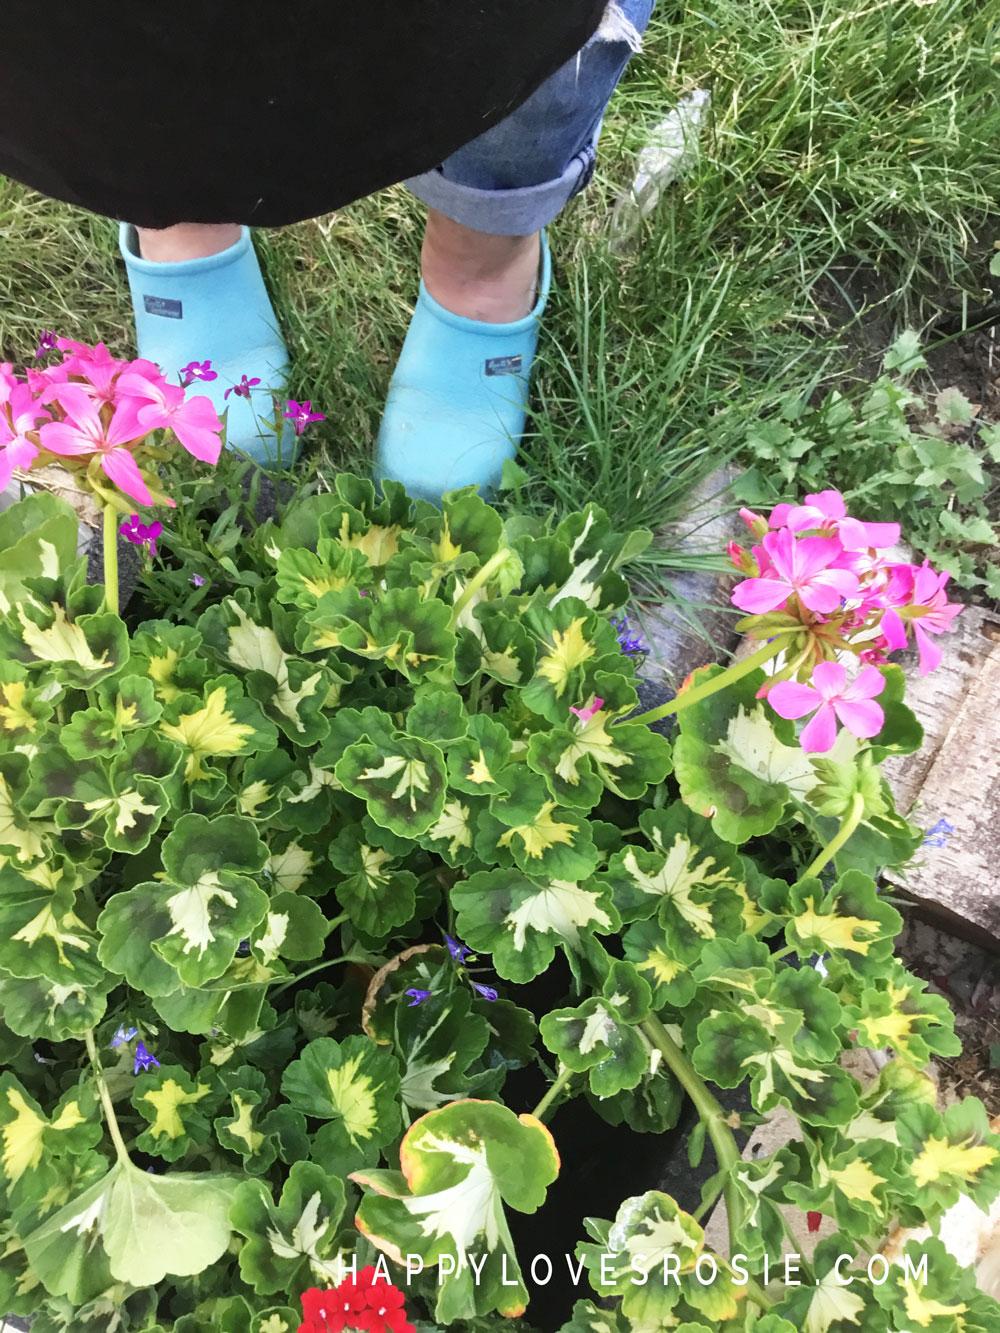 garden shoes and geraniums